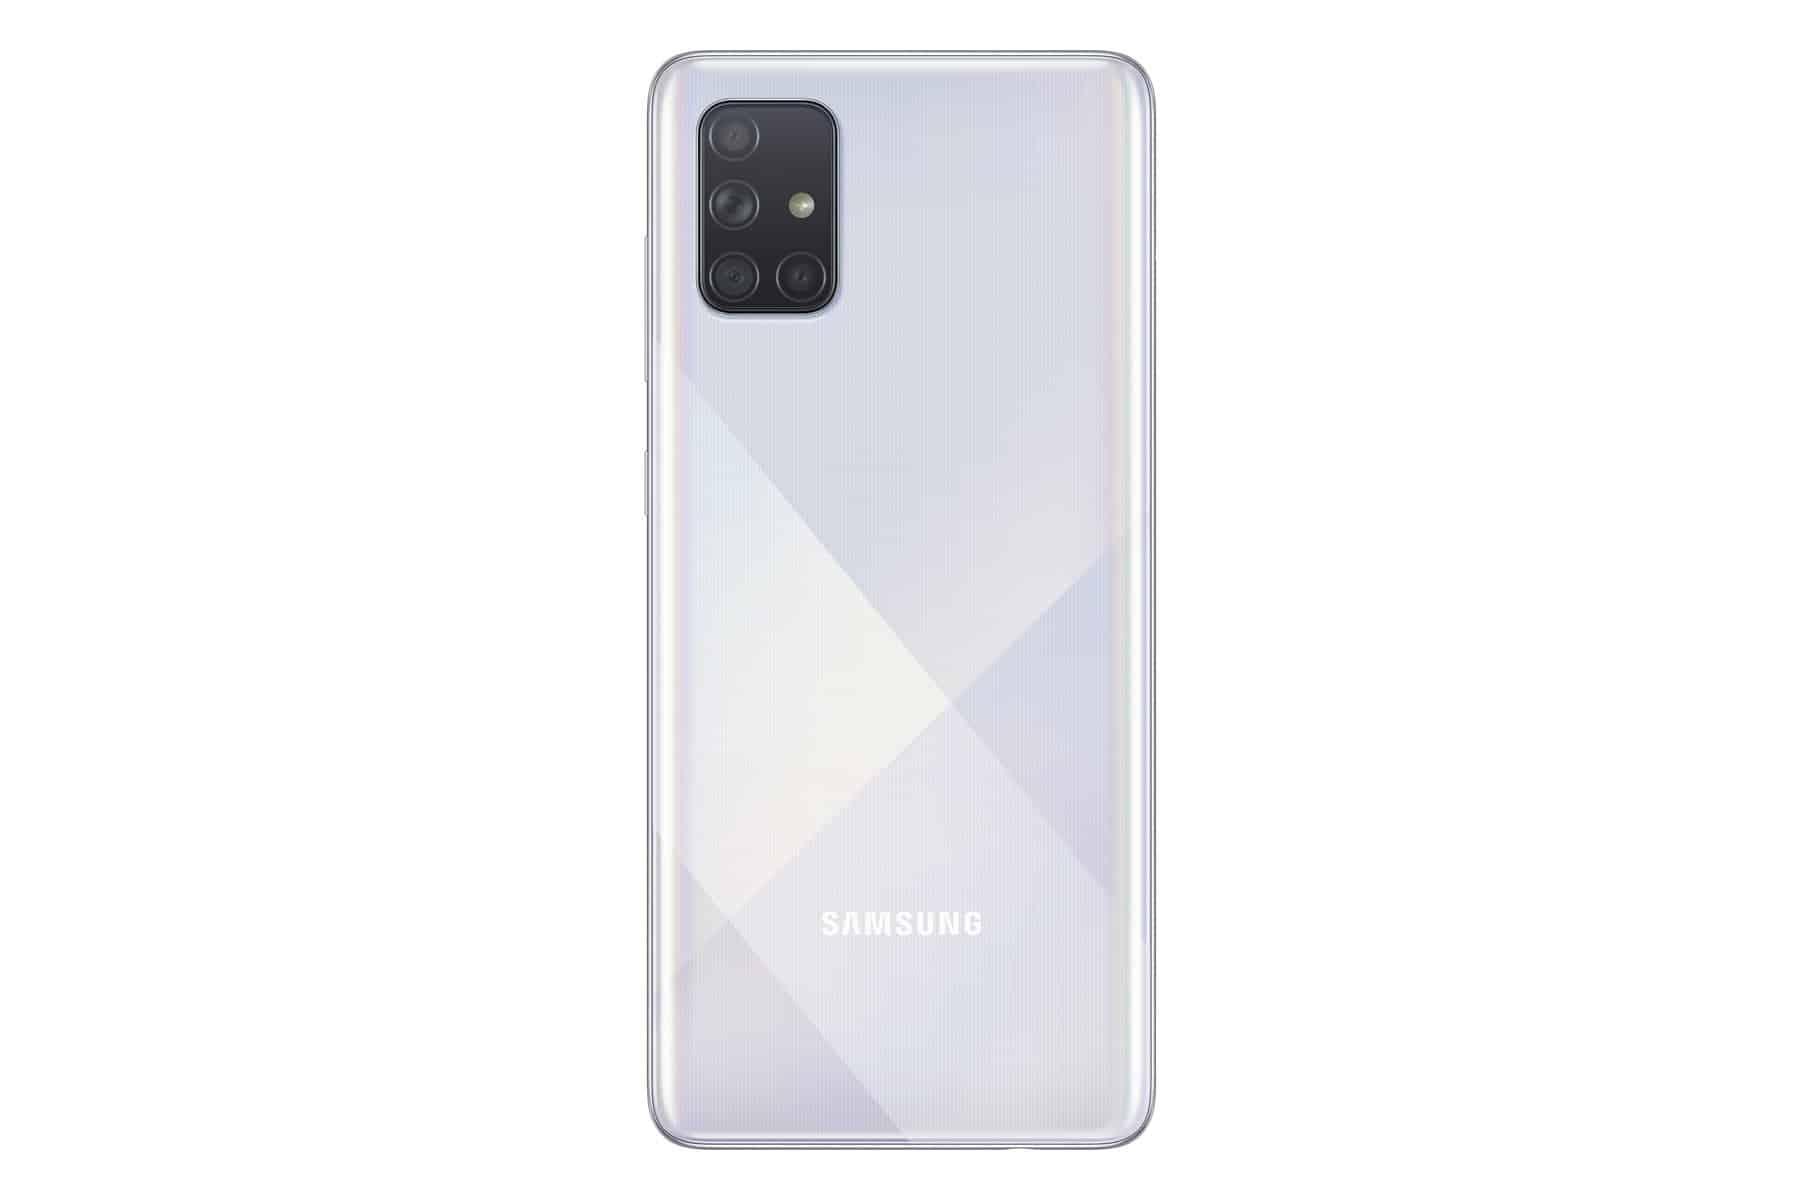 Galaxy A71 image 5